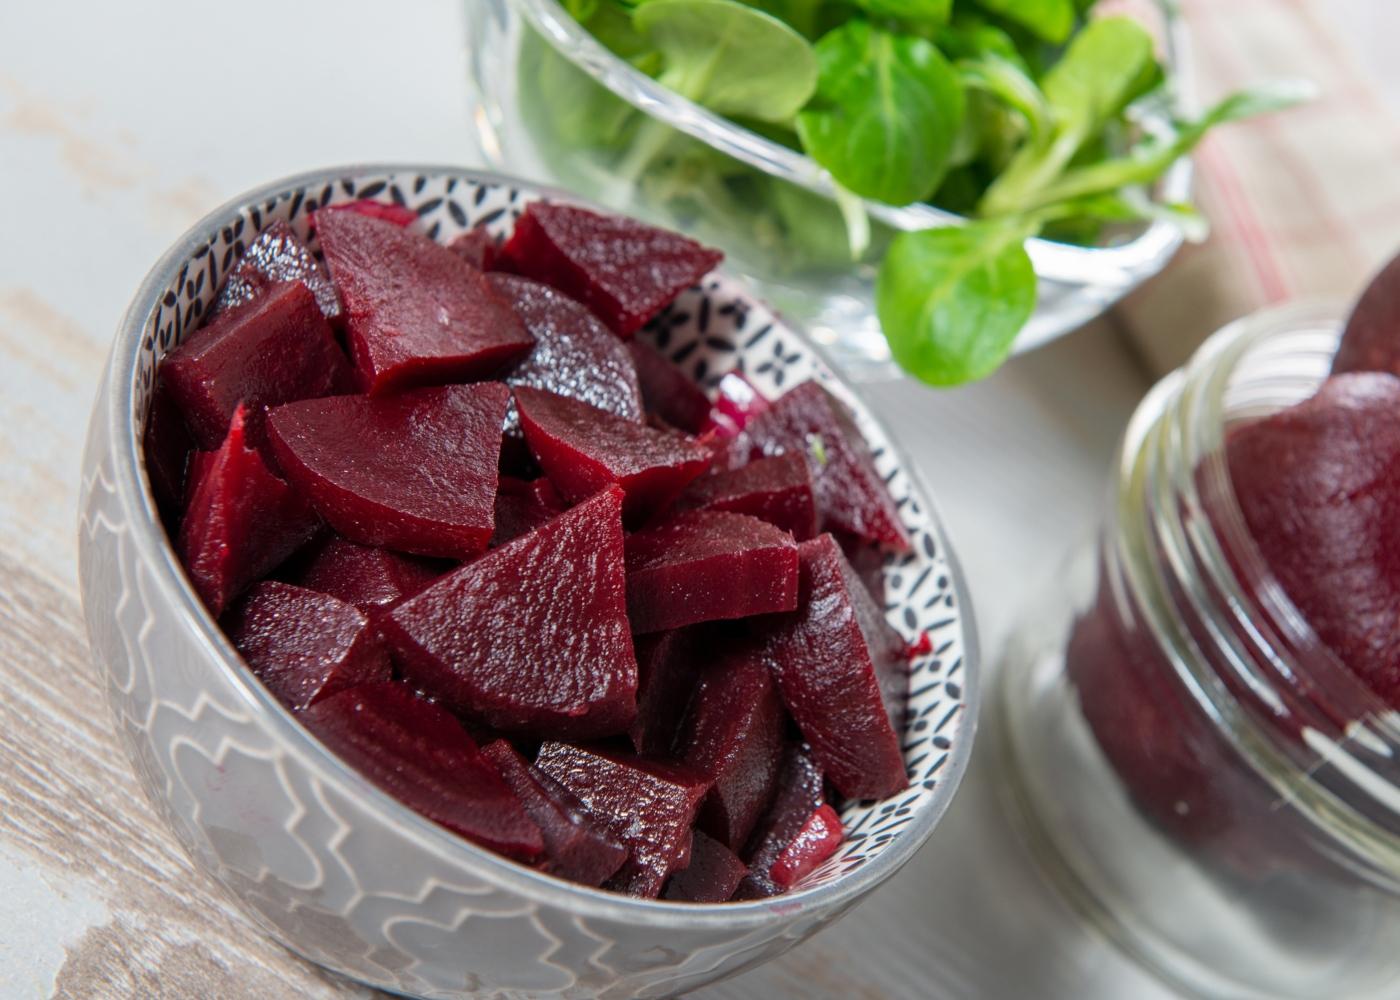 Alimentos que substituem a carne: beterraba